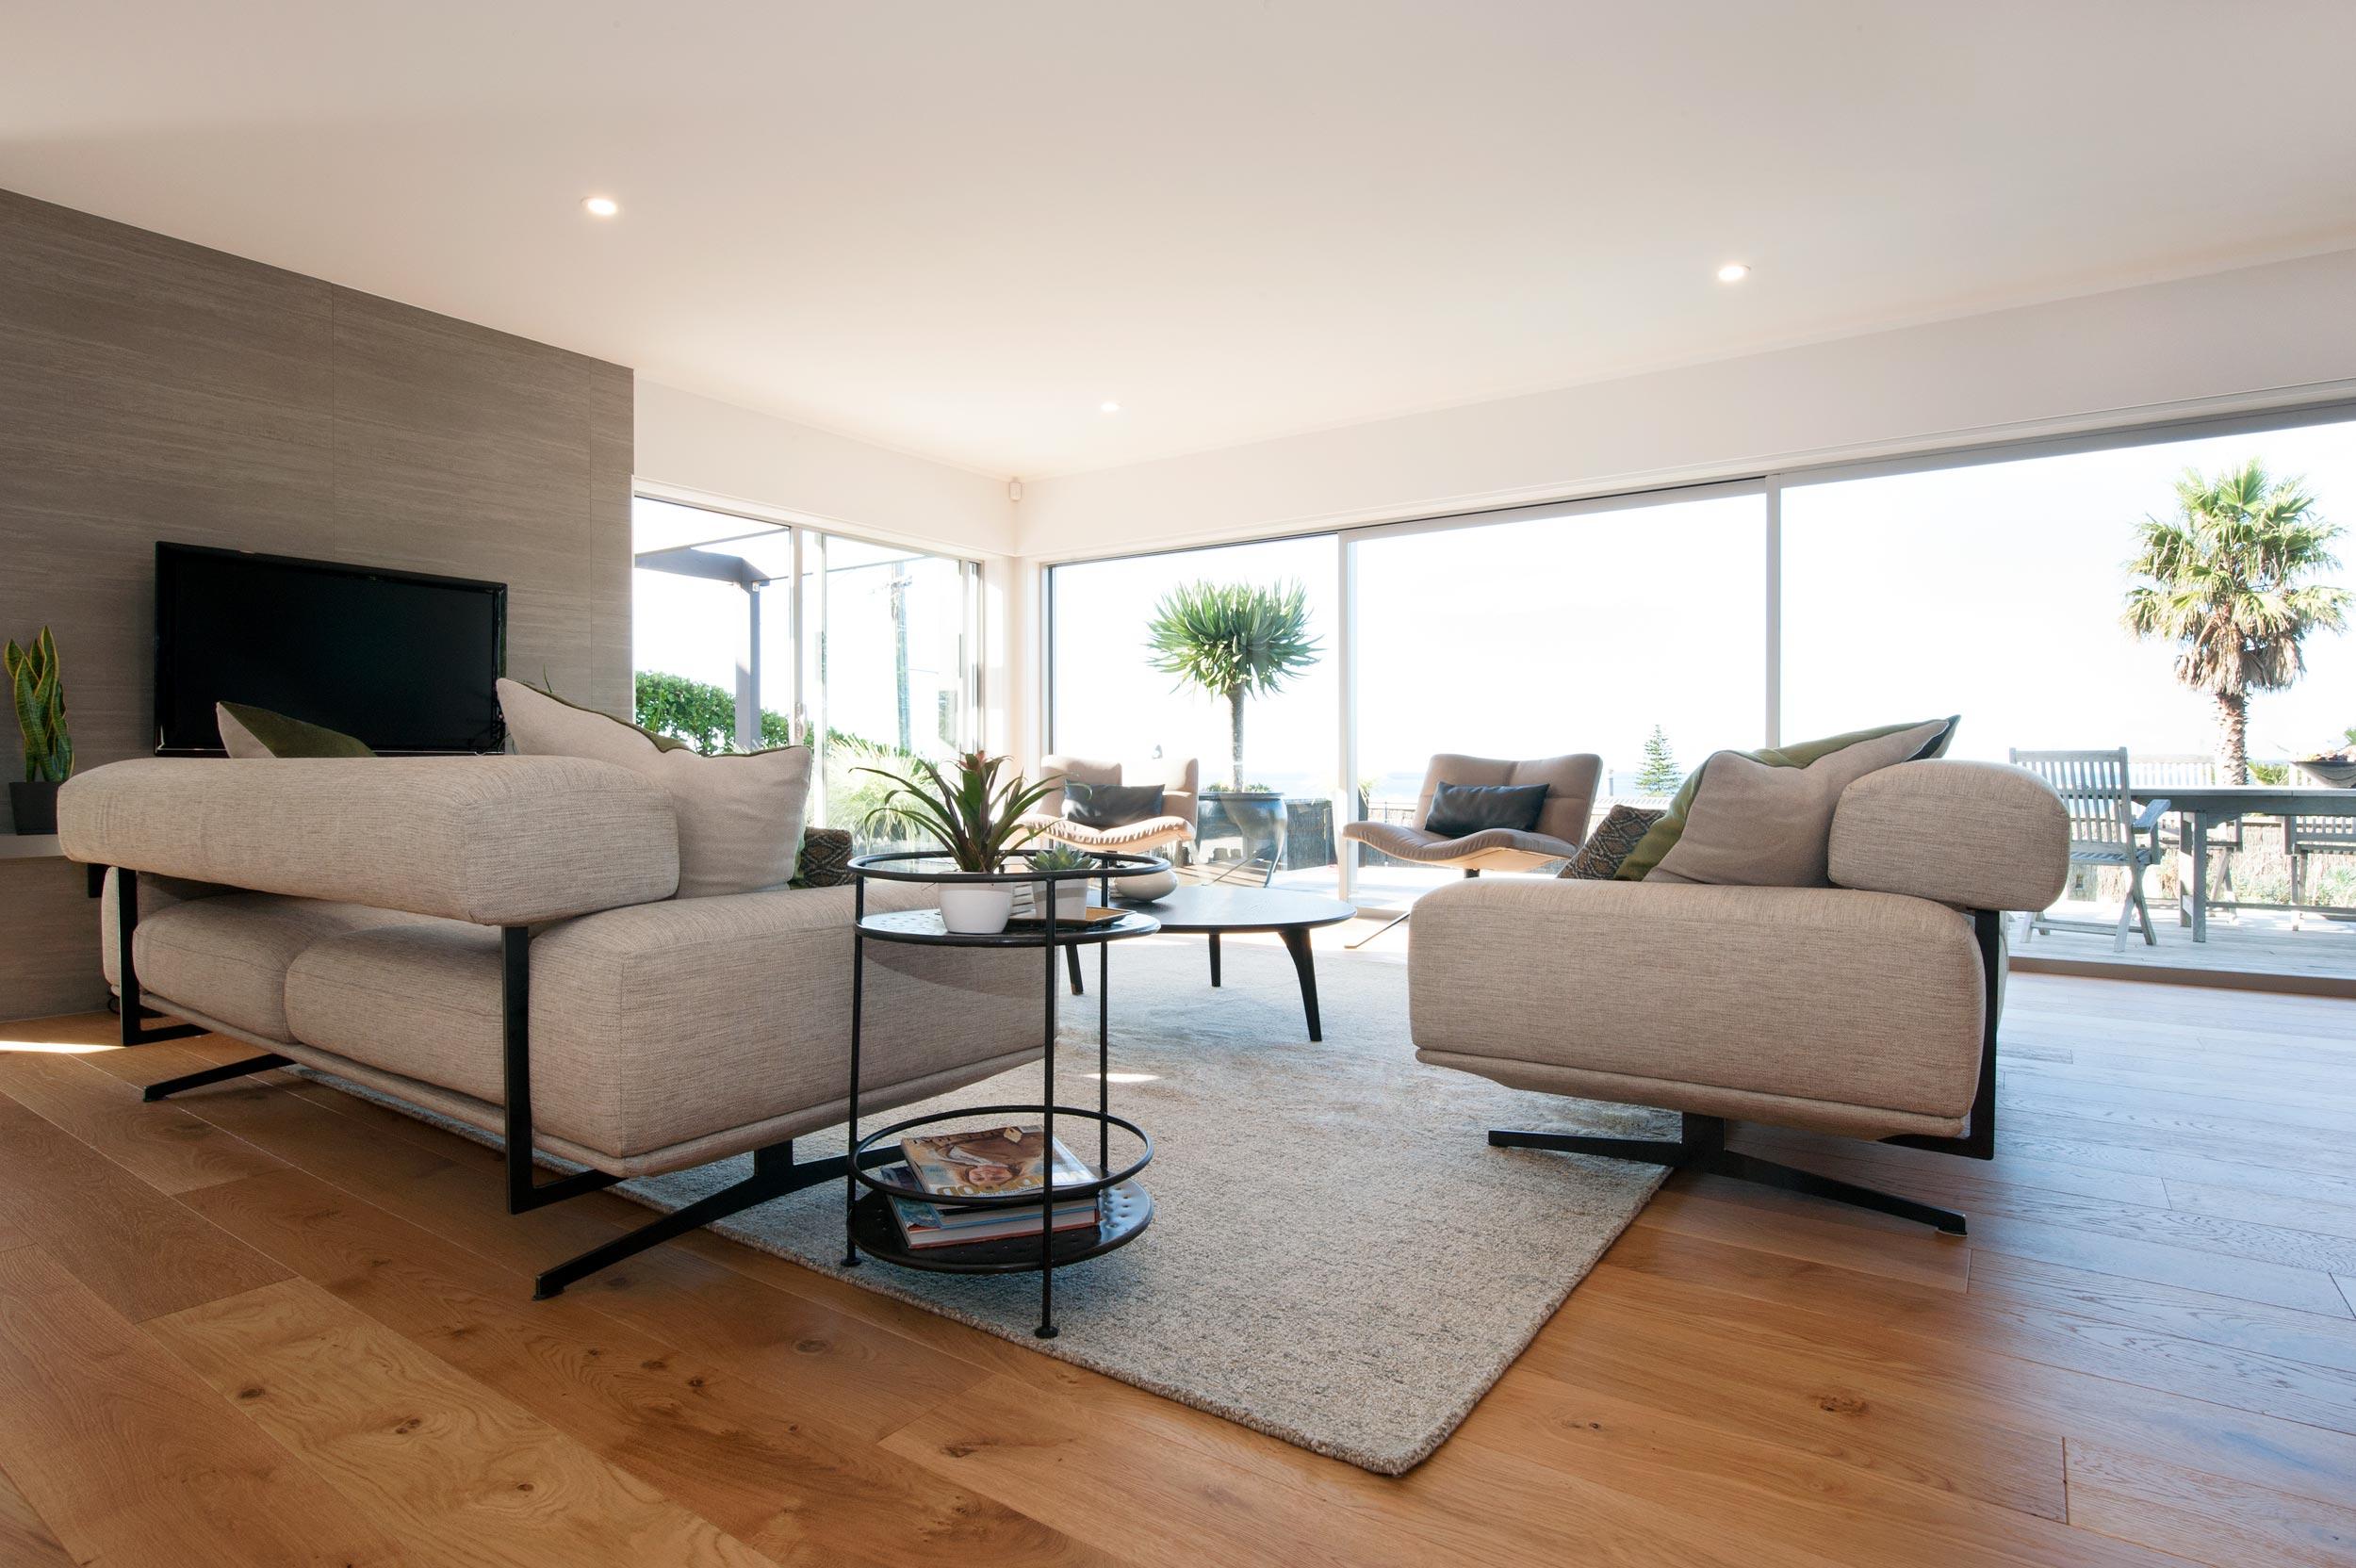 Kirsten Ford Design renovation red beach sofa